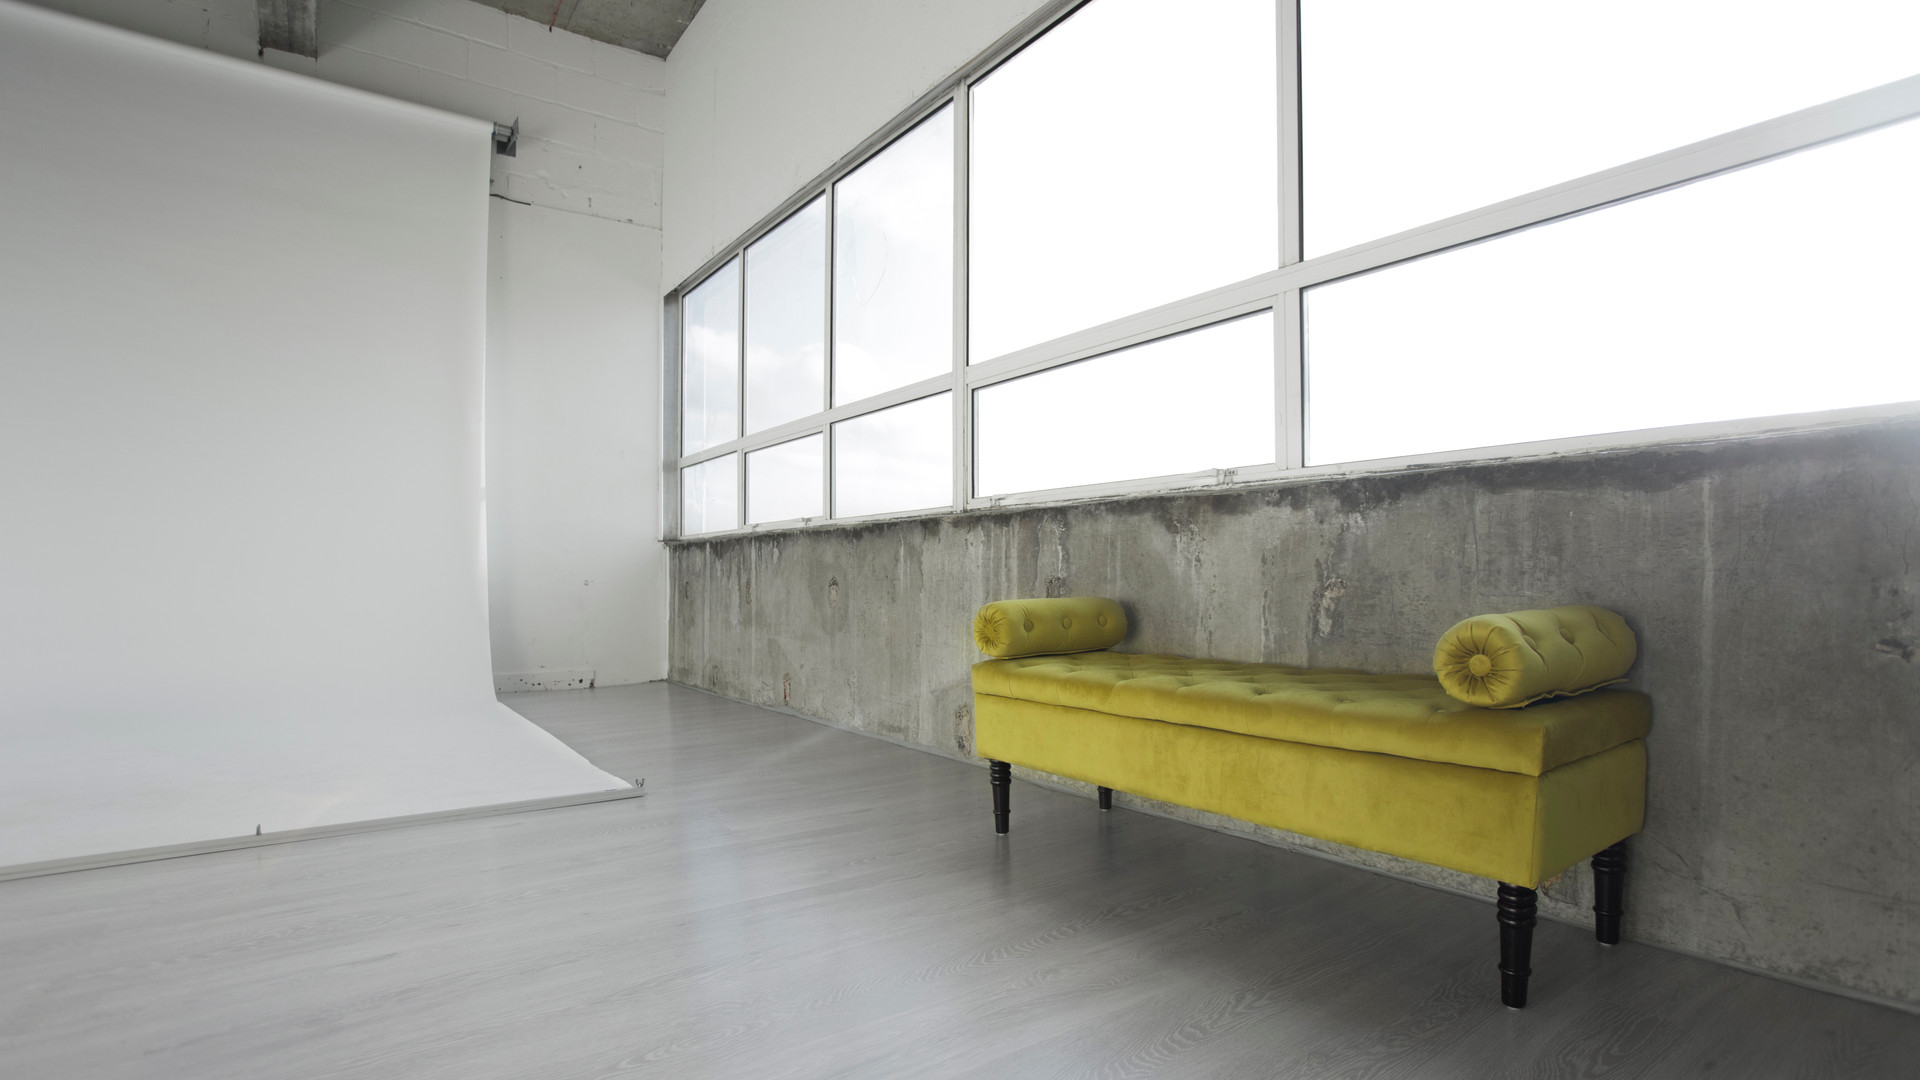 photography-studio-hire-daylight-silverspace-studios-3